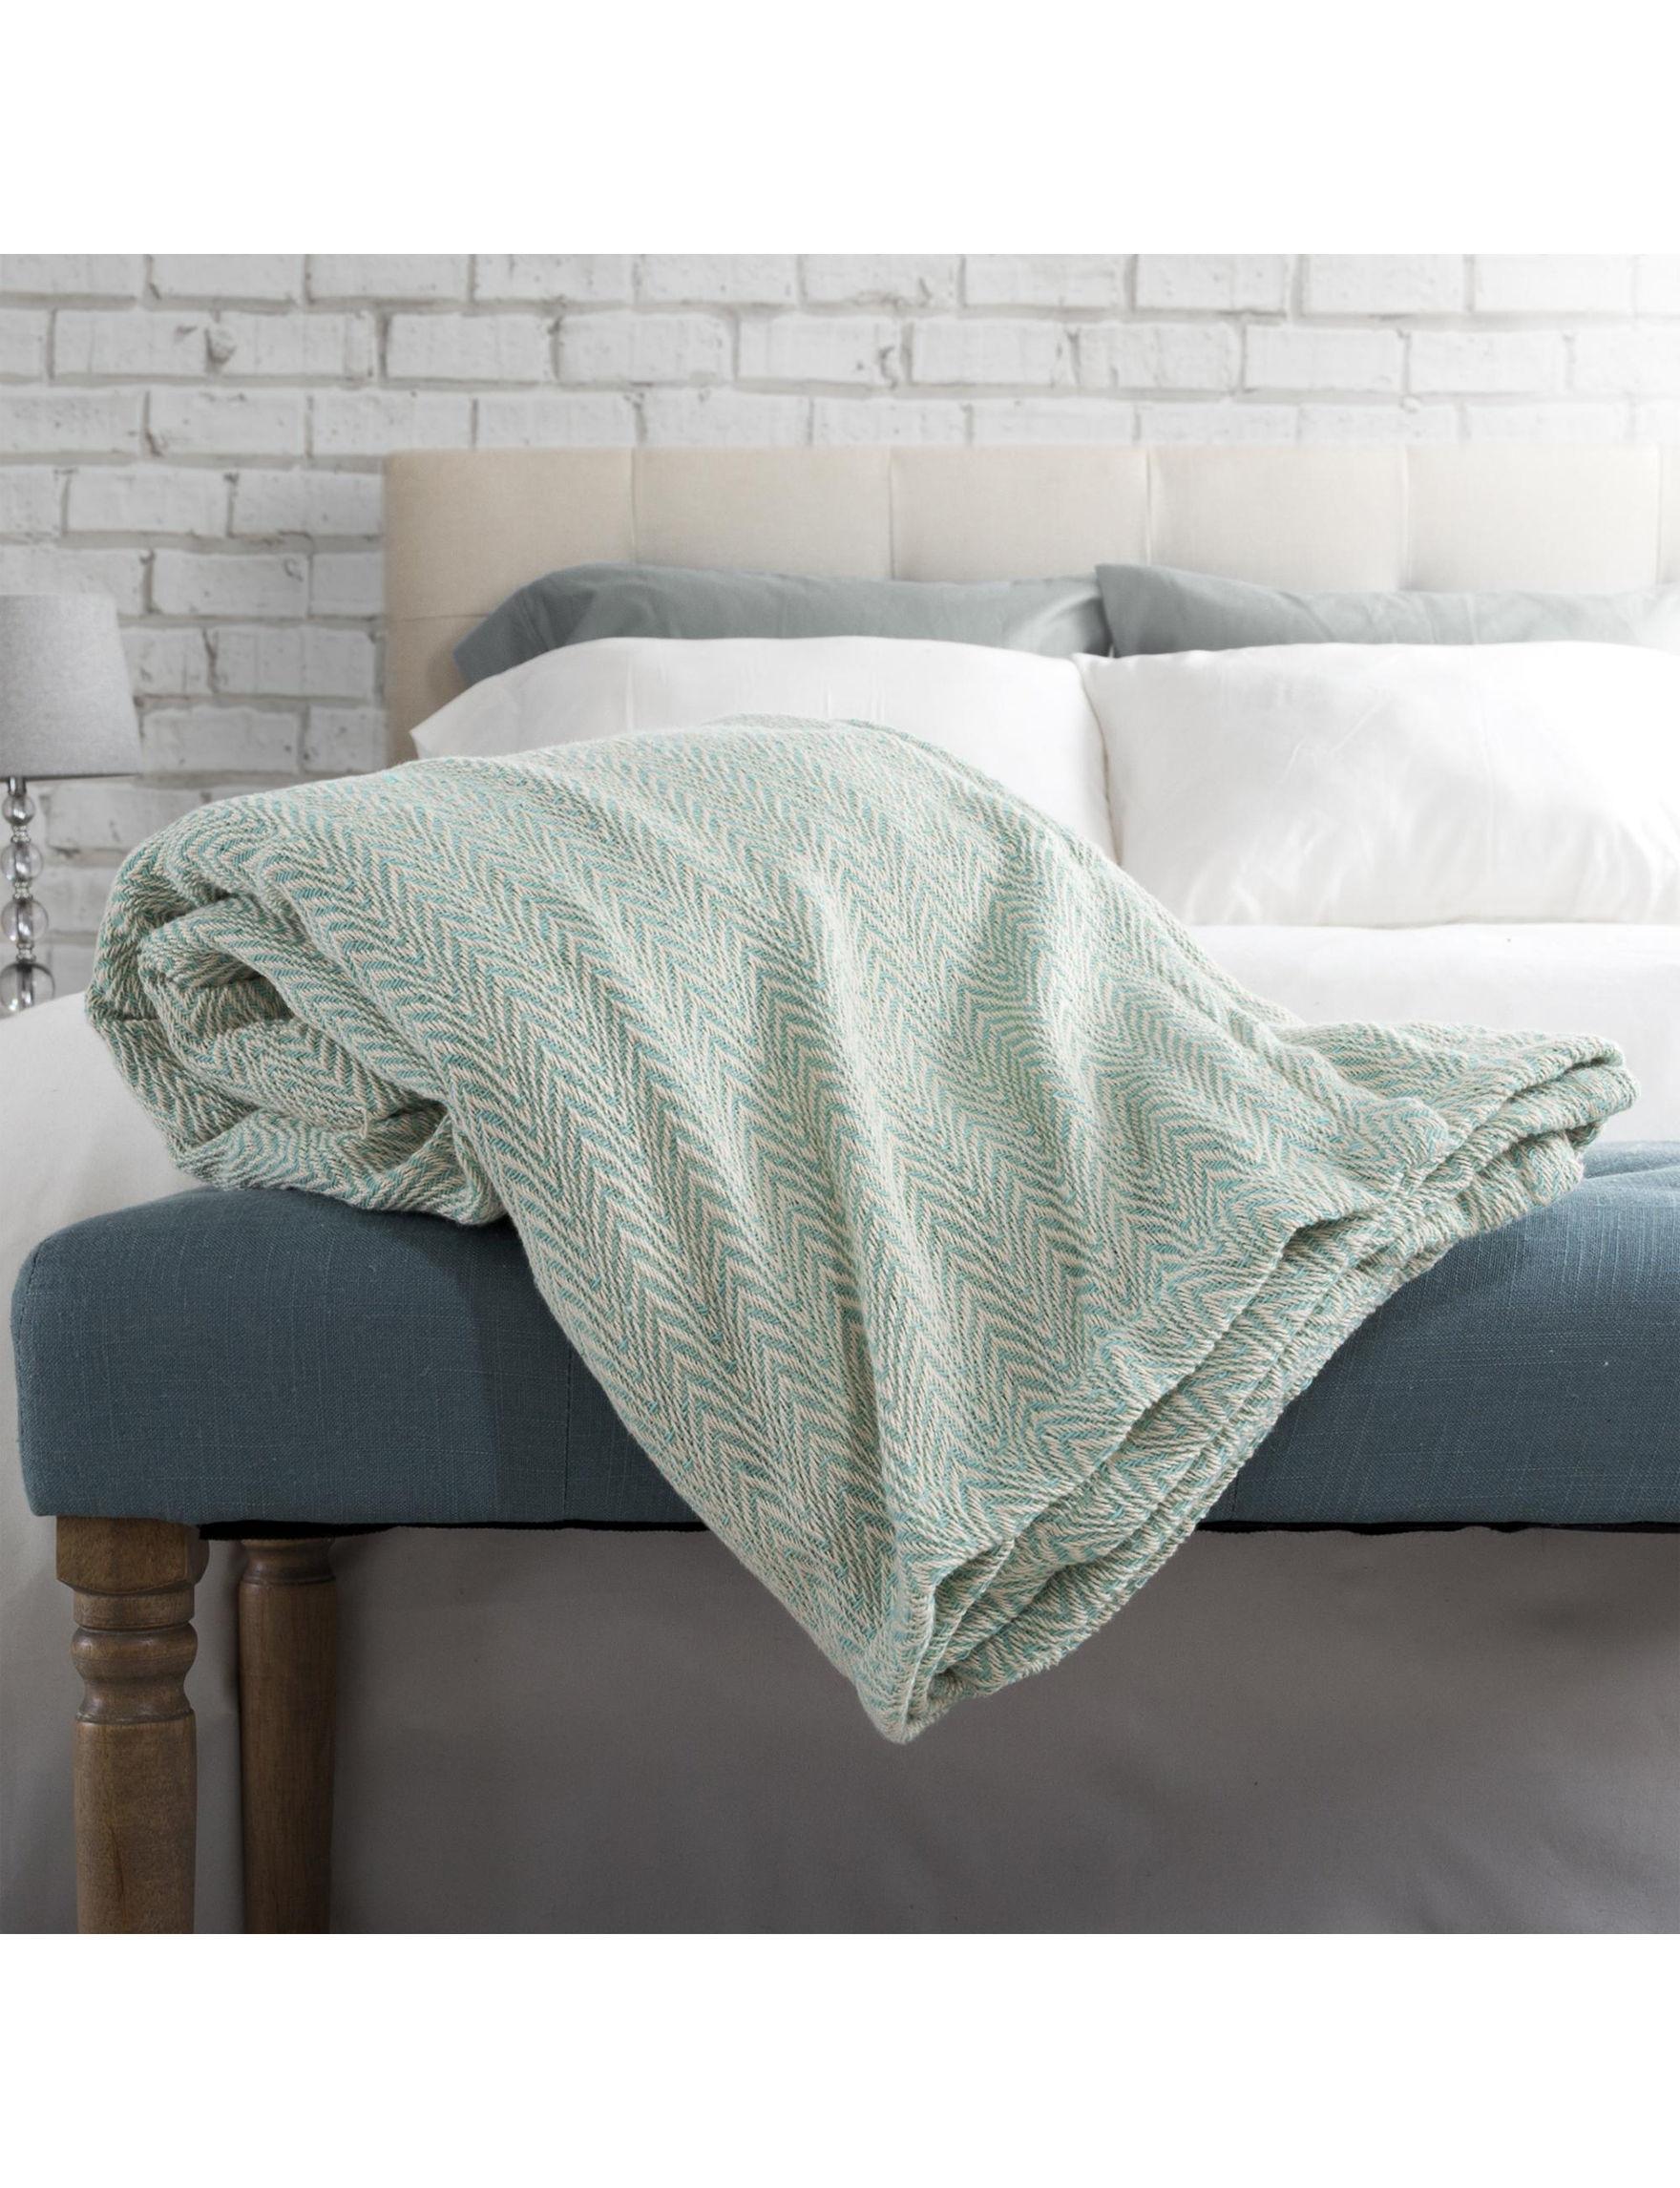 Lavish Home Light Green Blankets & Throws